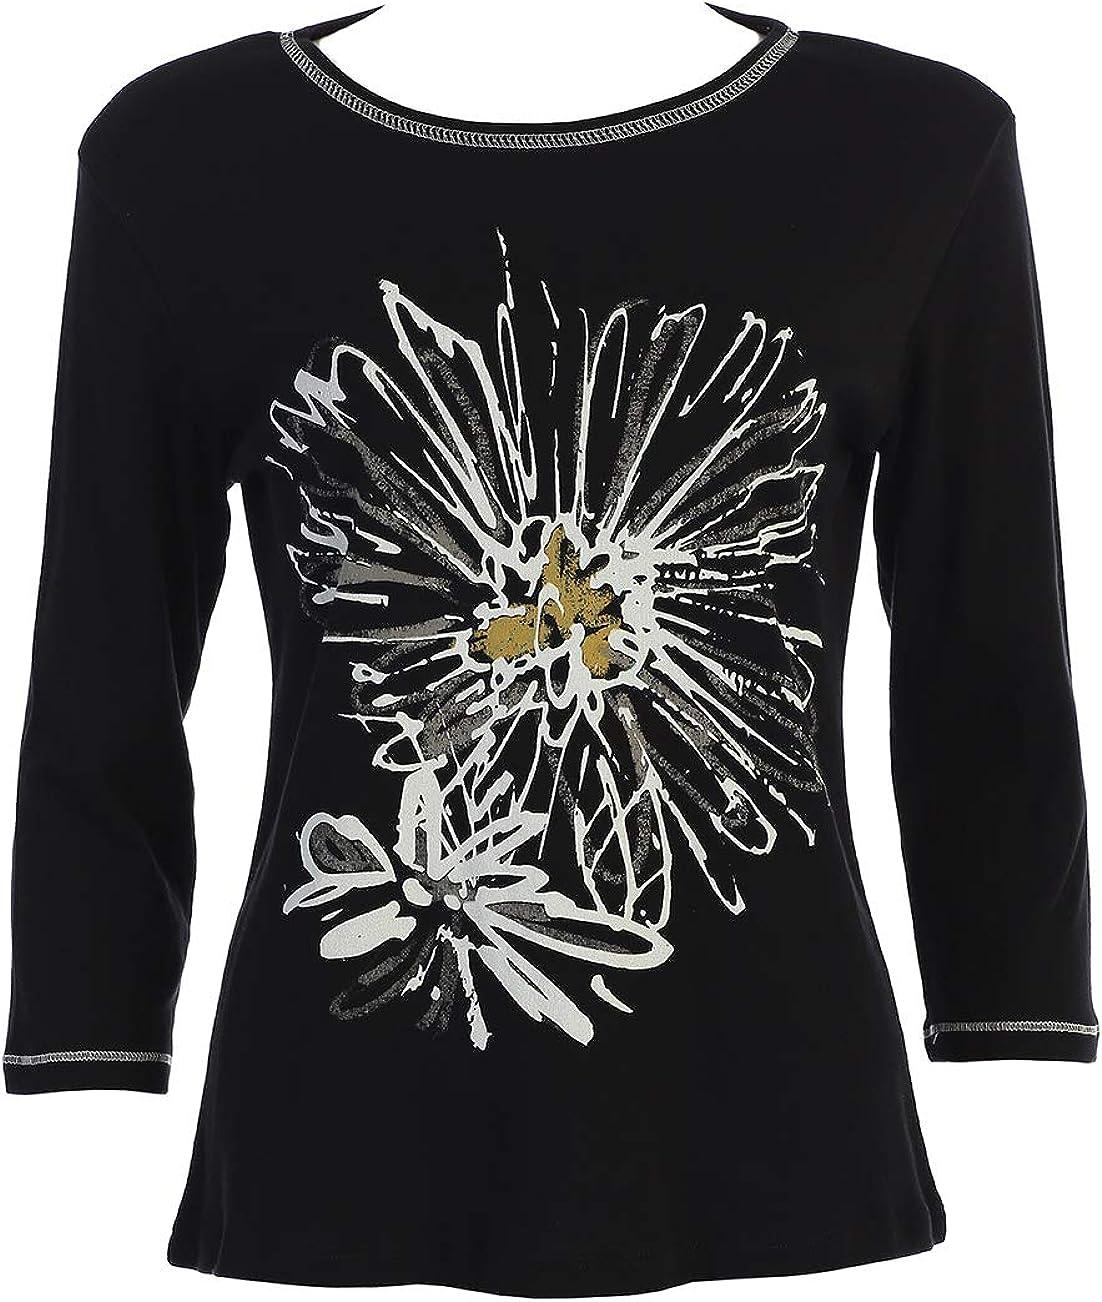 Jess Jane Mono Flower Cotton Black Top Nashville-Davidson Mall in Mail order cheap 14-1165